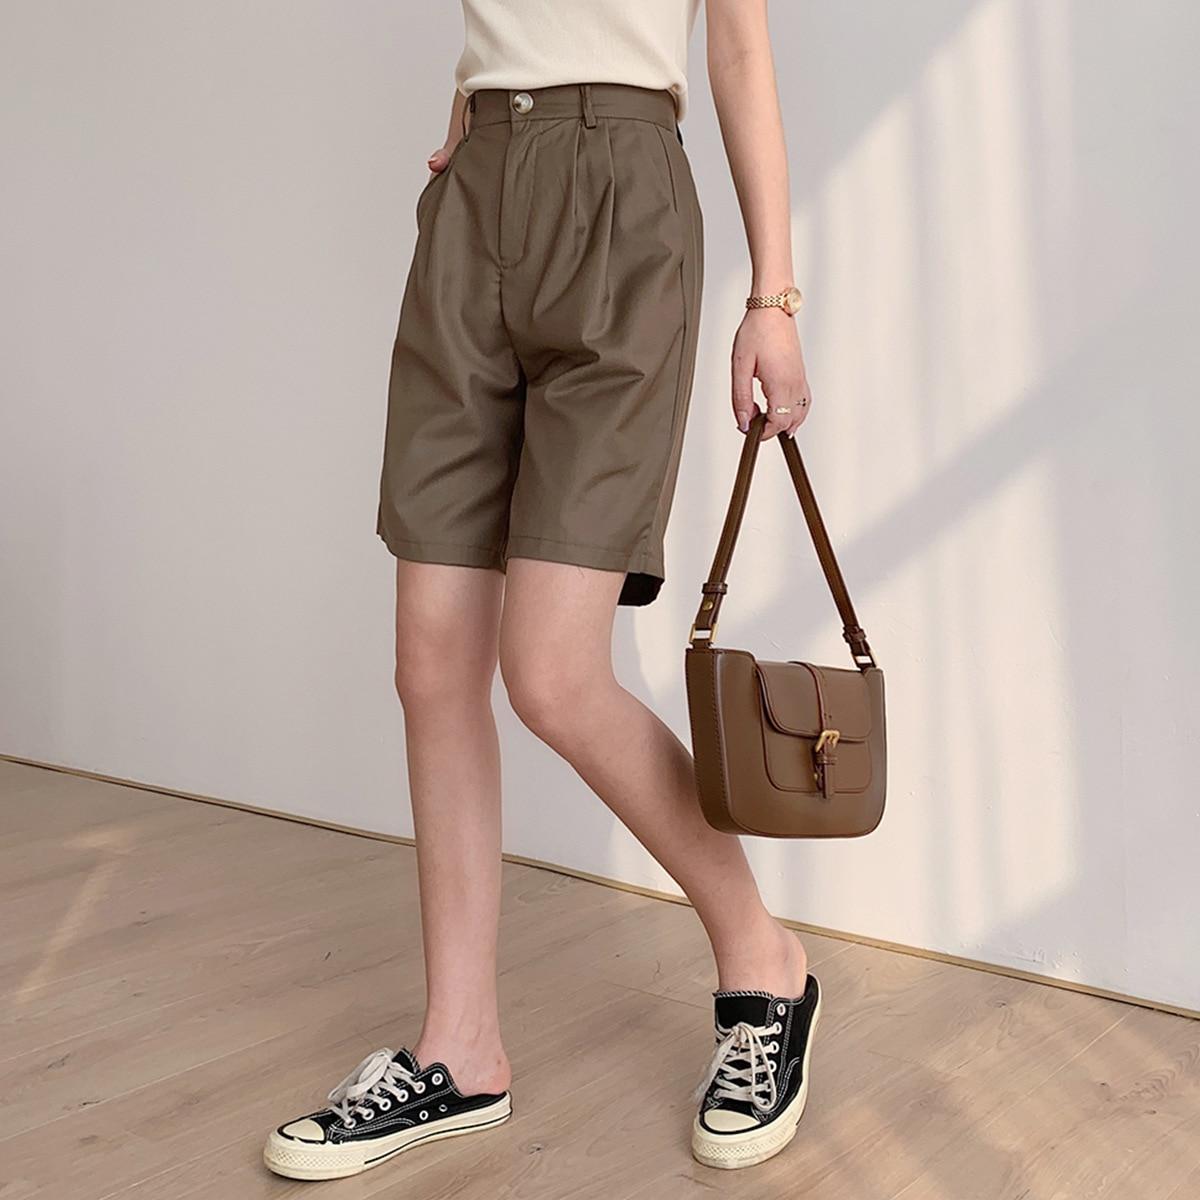 2020 New Women Summer White Short High Waist Women Casual Midi Shorts With Belt Wide Leg Boho Pantalones Feminino